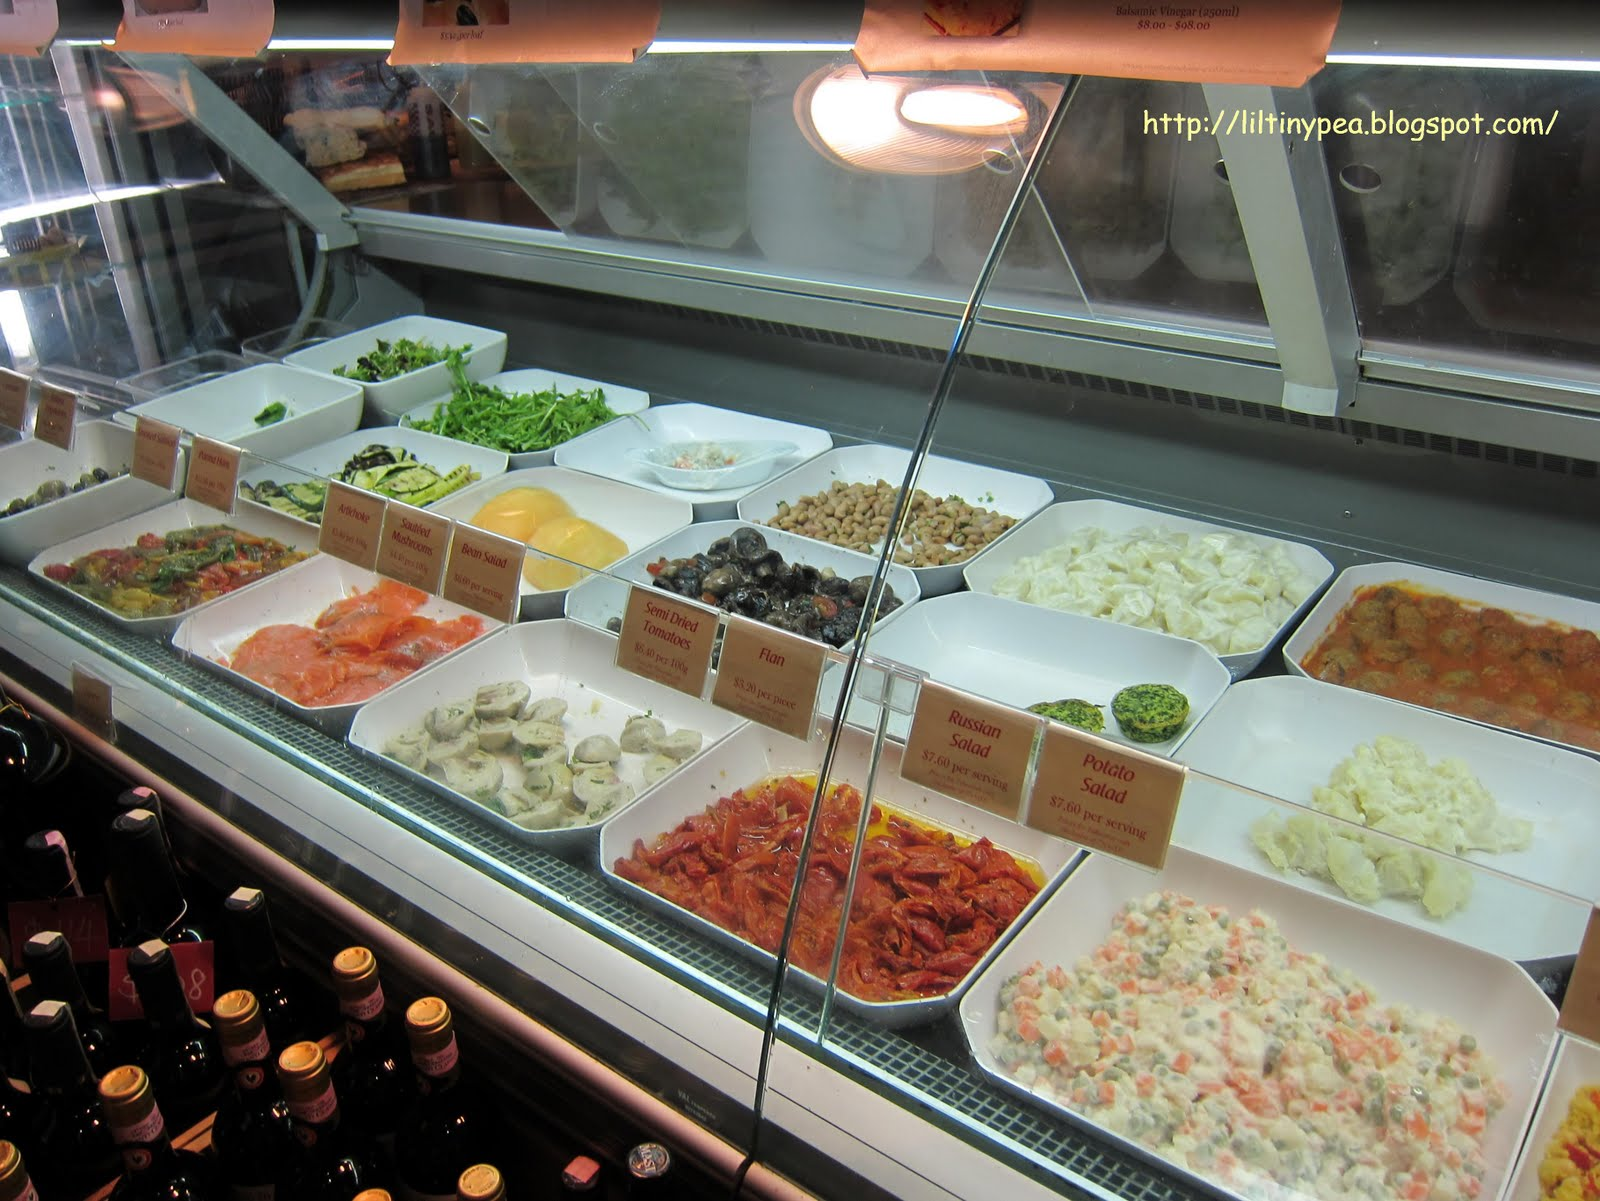 Tiny Peas Travel & Foodie experiences: [Foodie] Galbiati Gourmet Del...